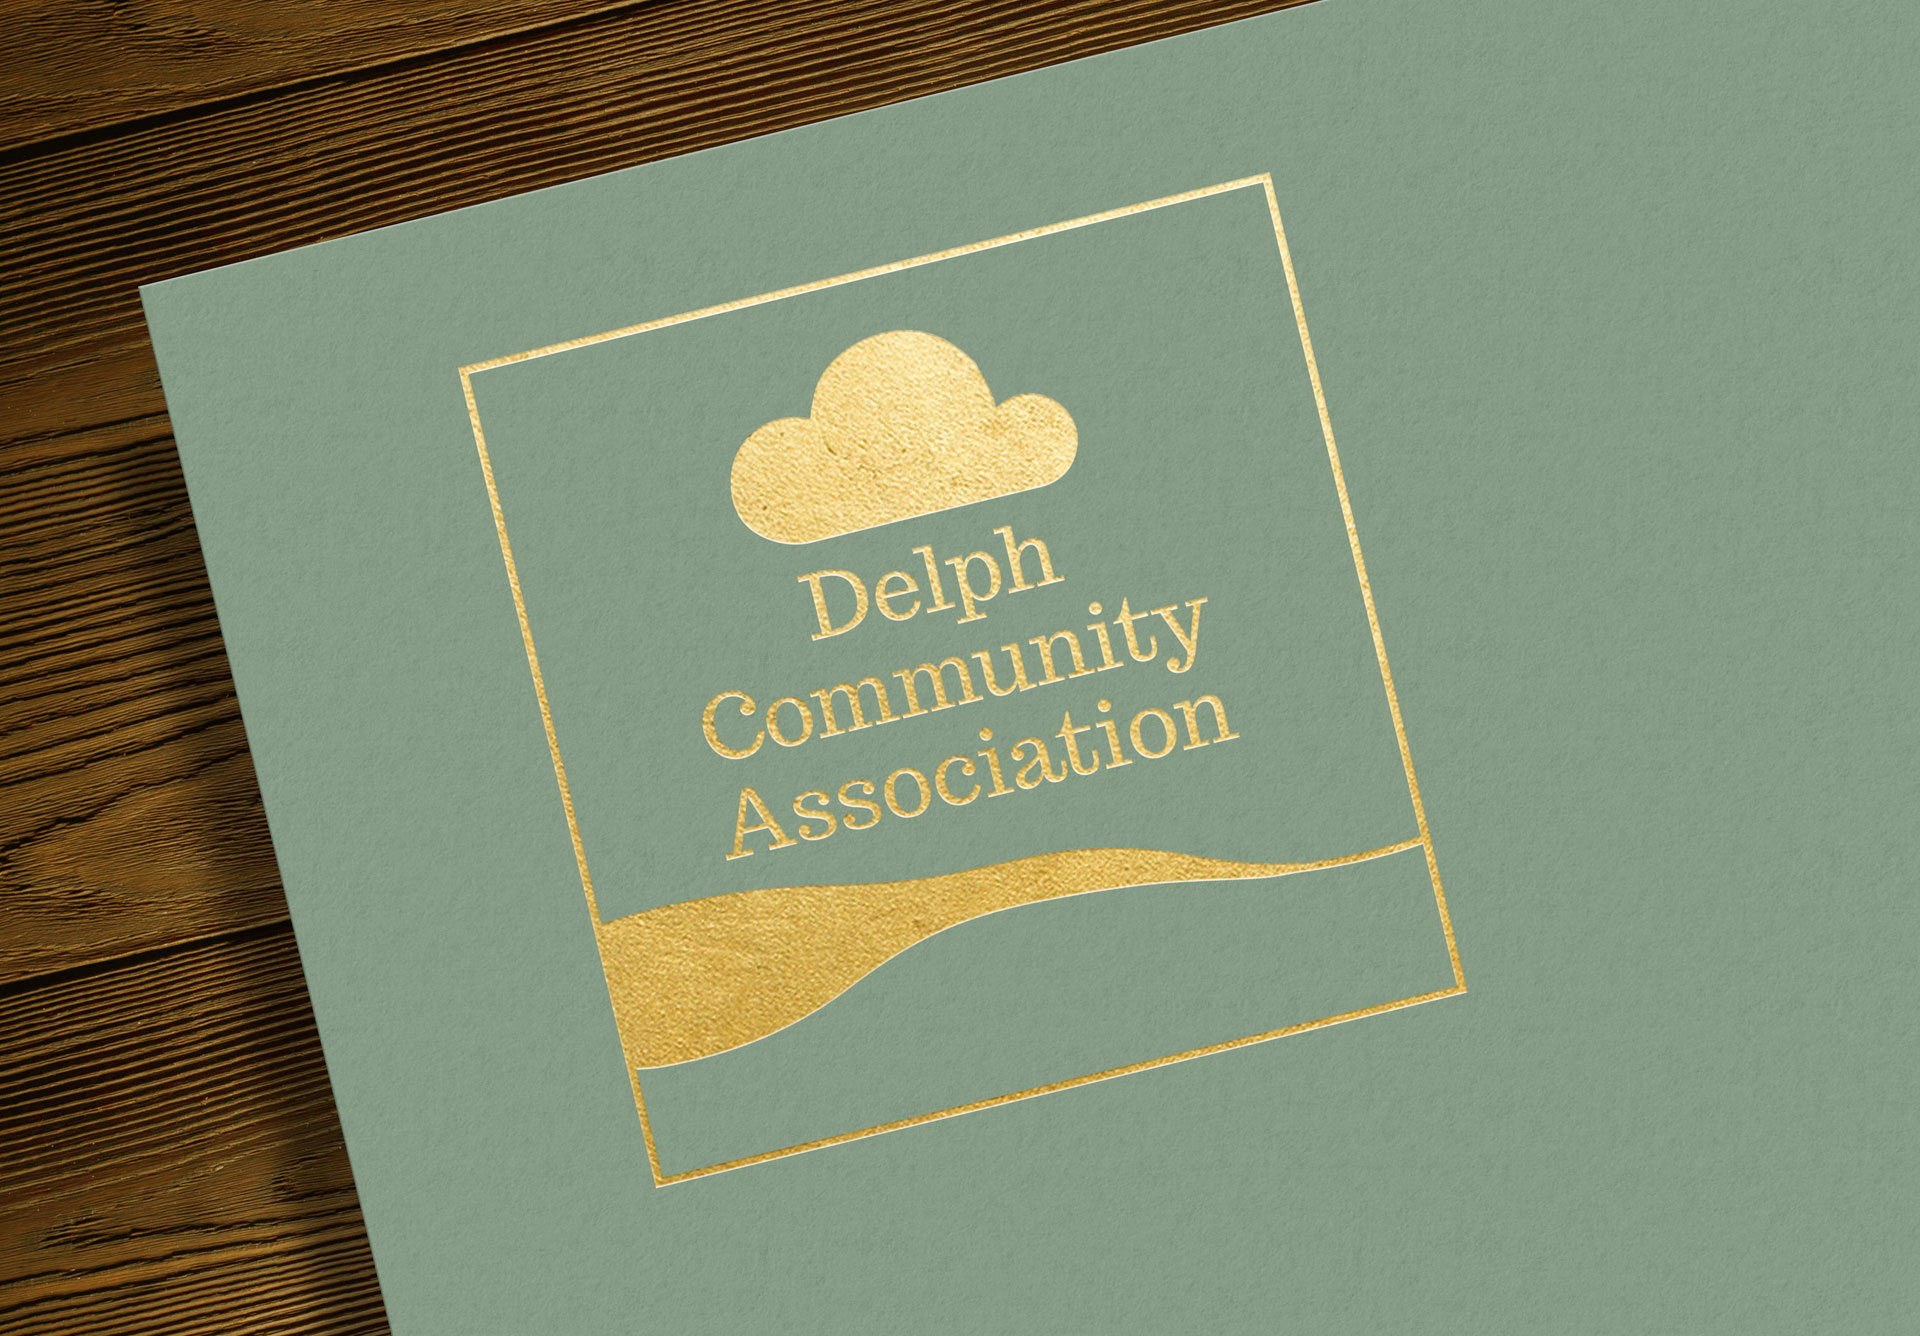 Delph Community Association